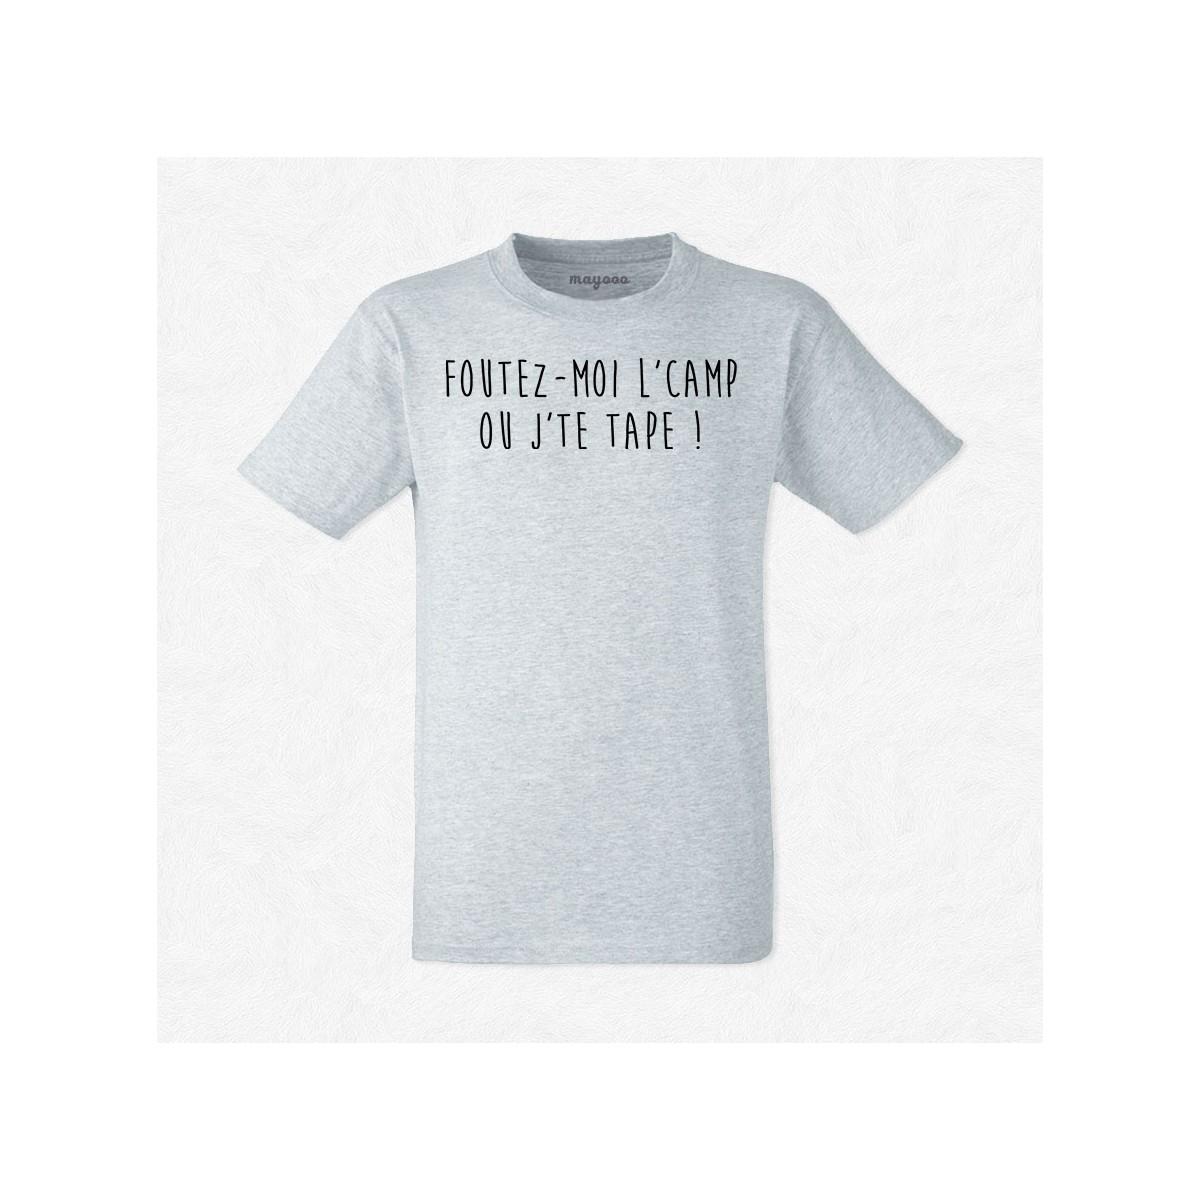 T-shirt Foutez moi l'camp